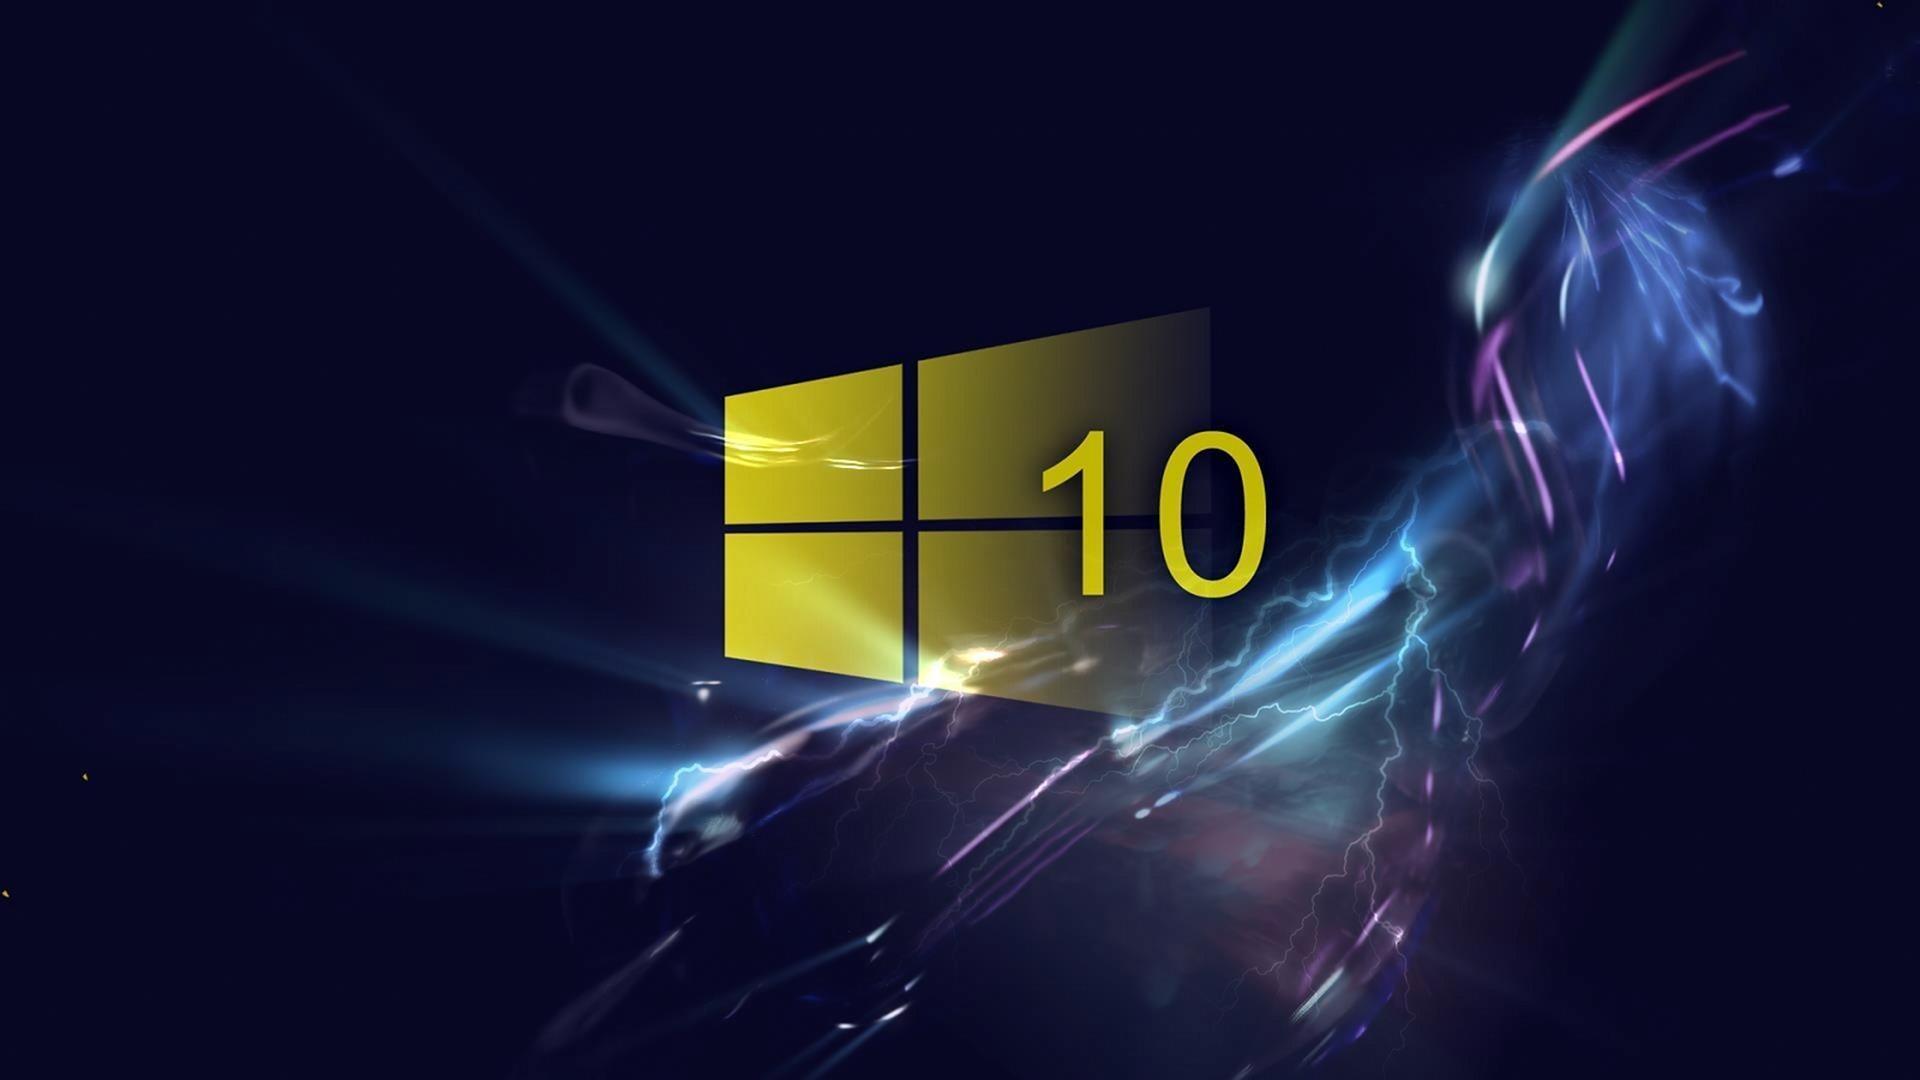 Windows 10 Desktop Background – Windows 10 Wallpapers